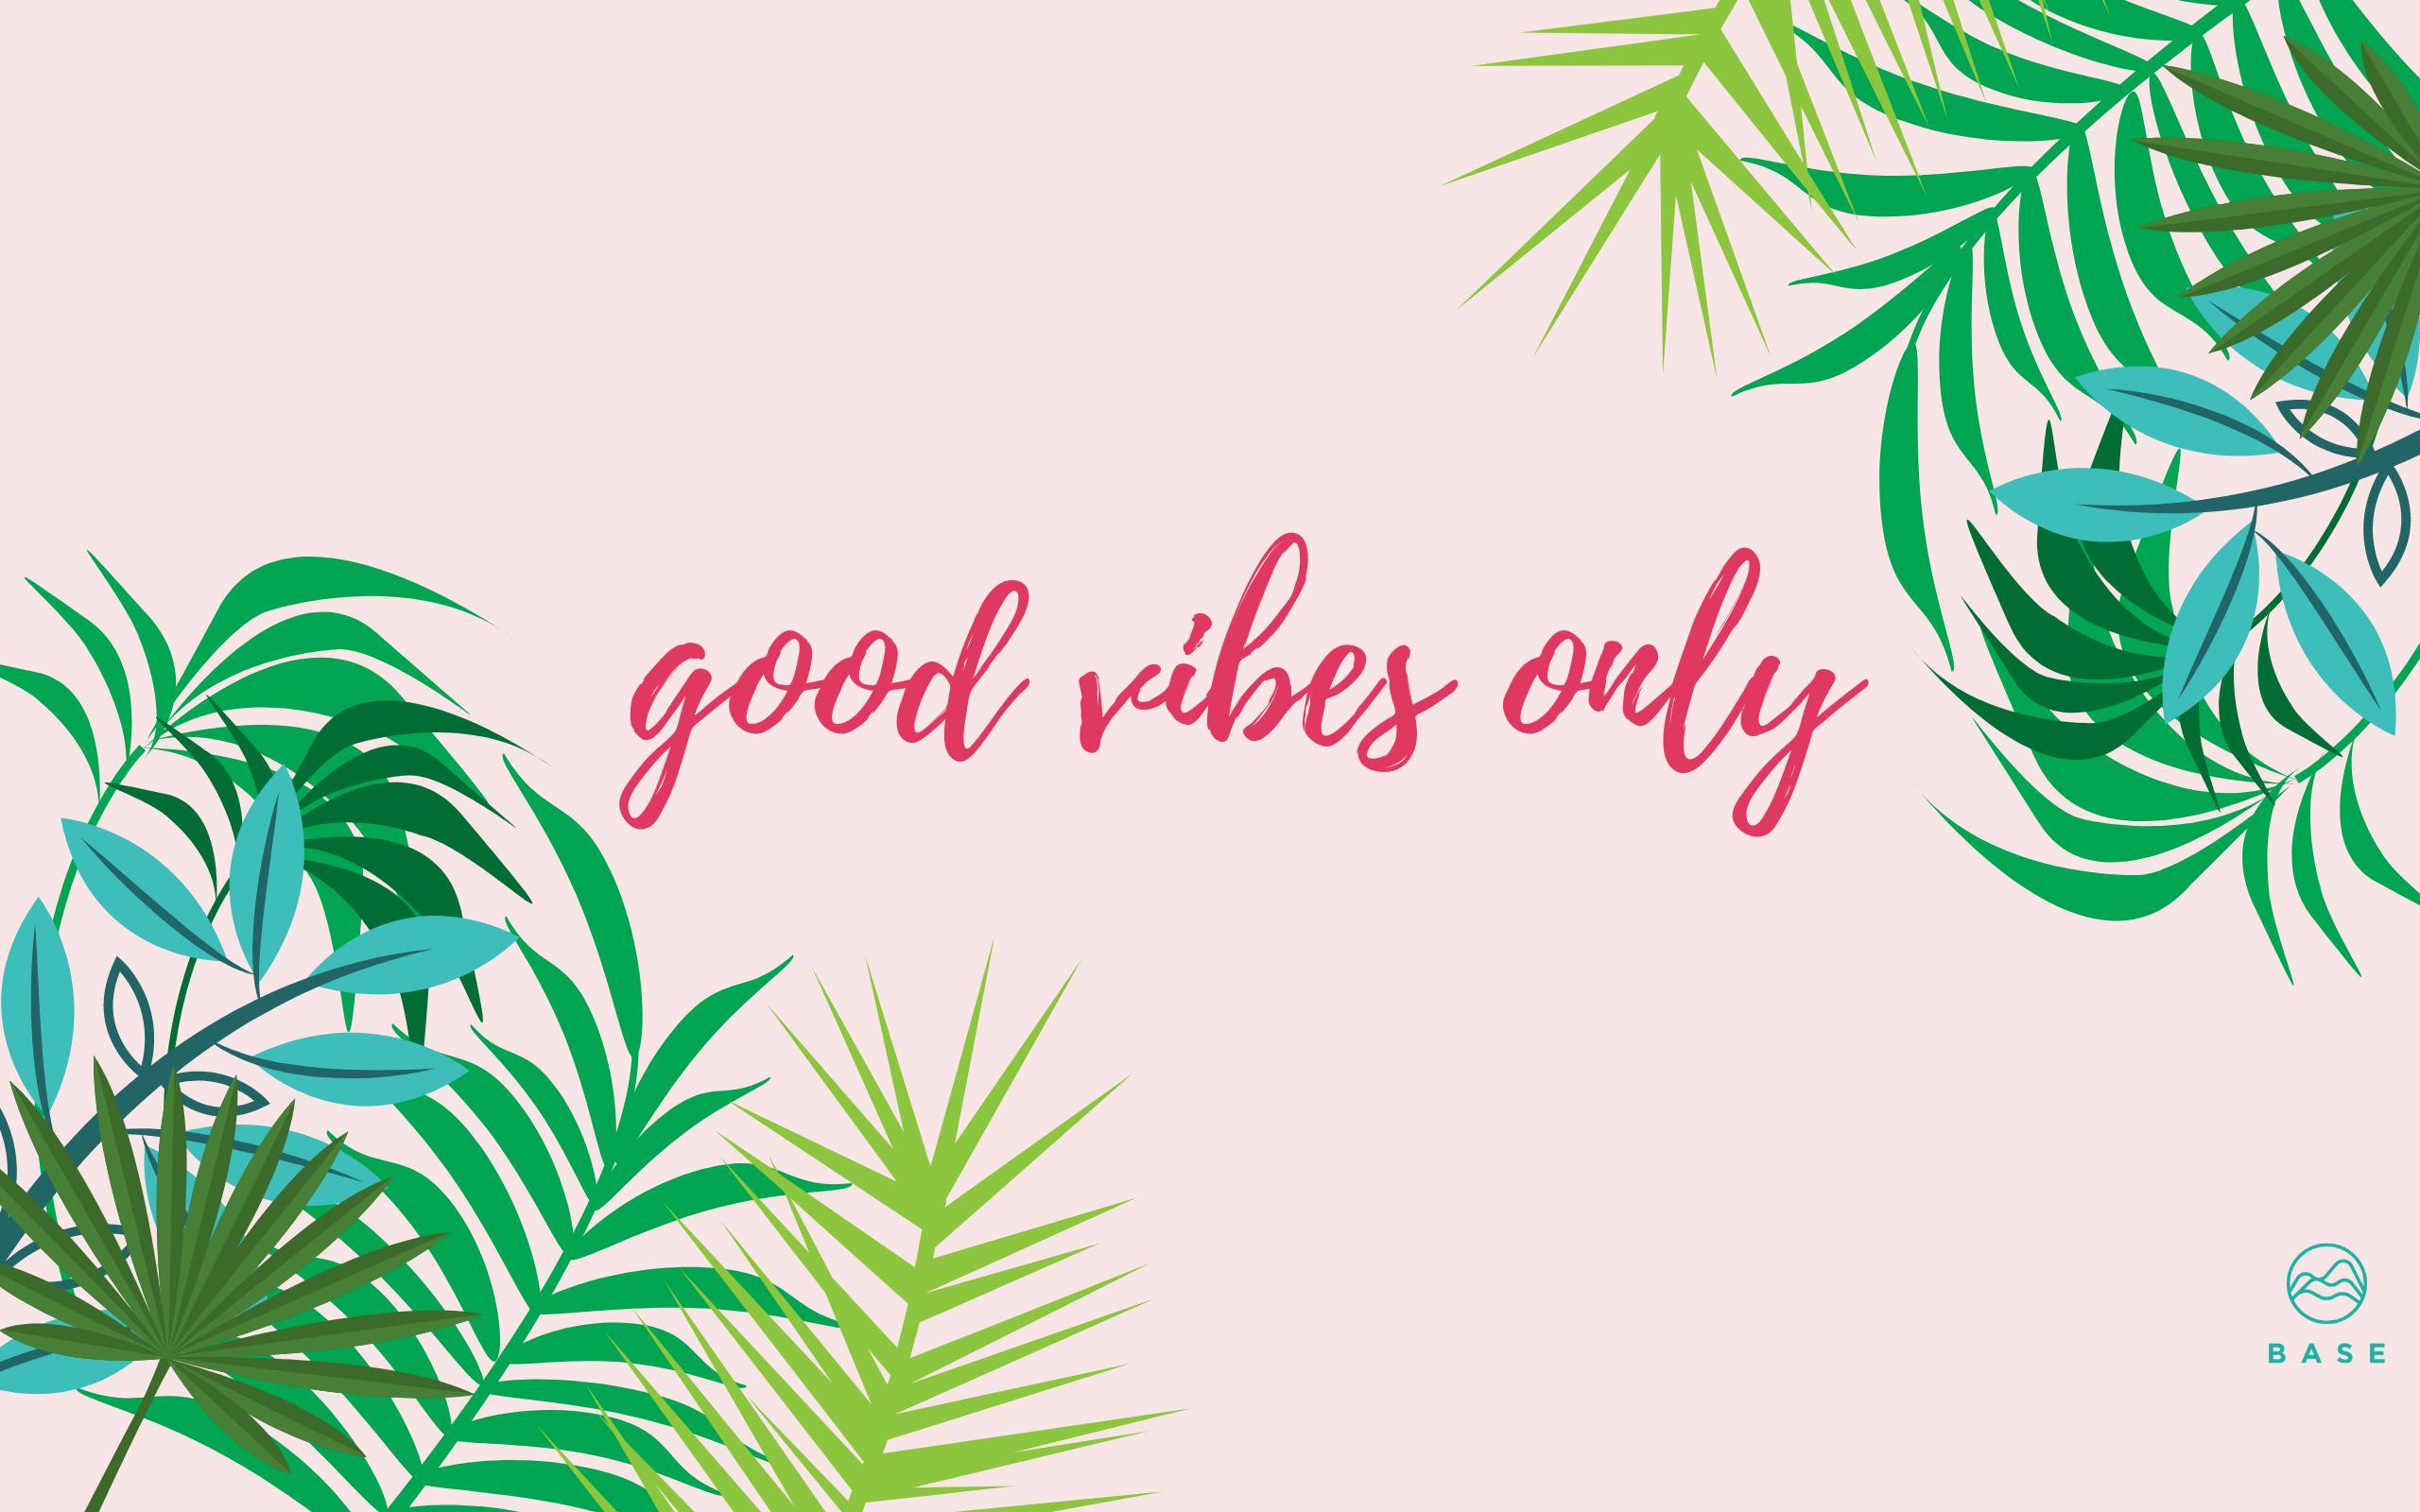 Positive Vibes Desktop Wallpapers Top Free Positive Vibes Desktop Backgrounds Wallpaperaccess